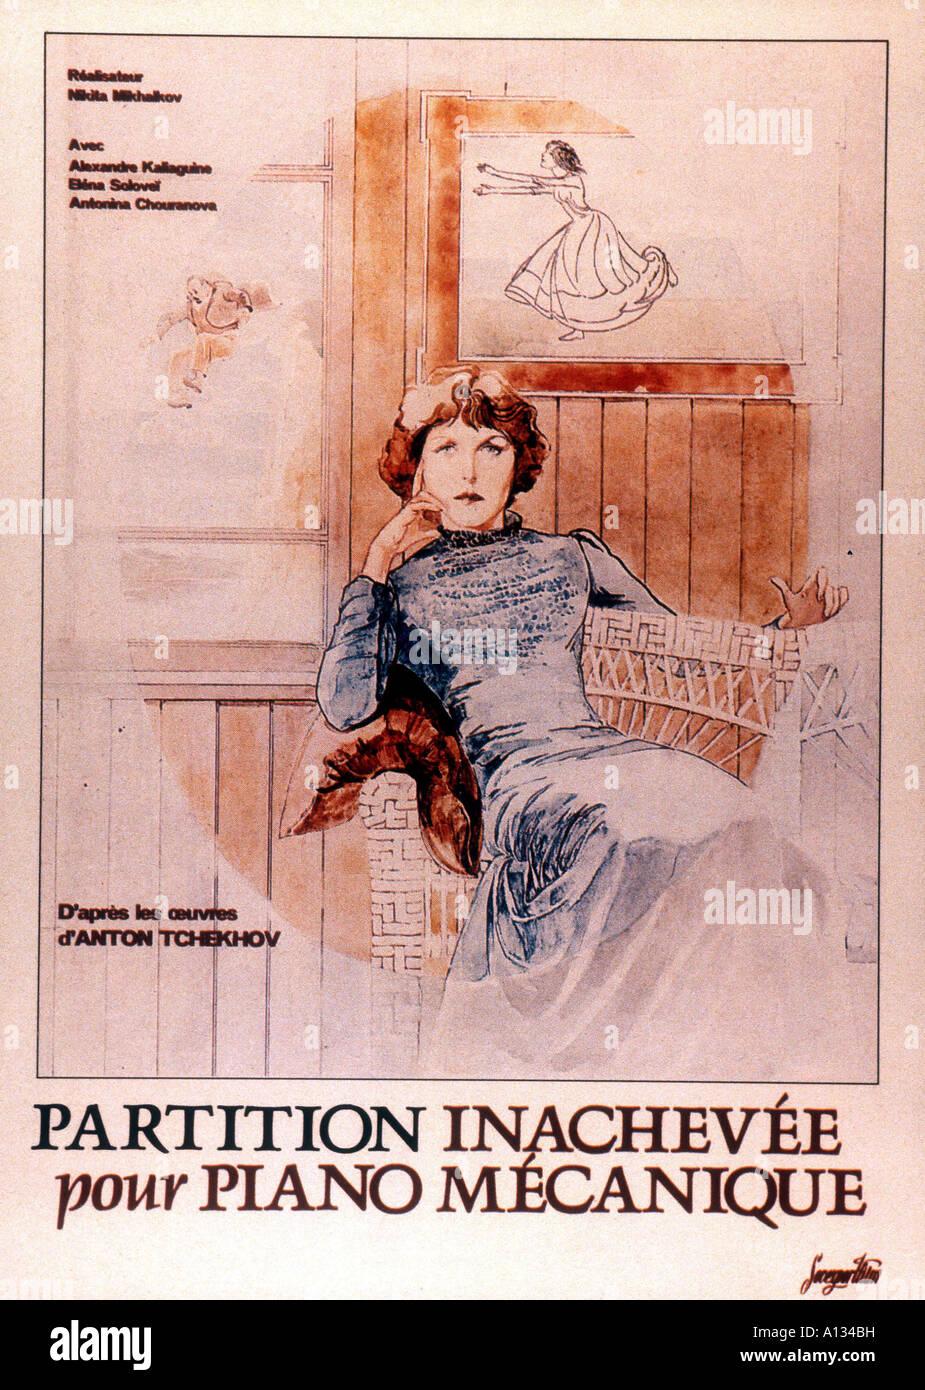 Neokontchennaia piesa dlia mekhanitcheskogo pianino 1977 Nikita Mikhalkov Movie poster - Stock Image